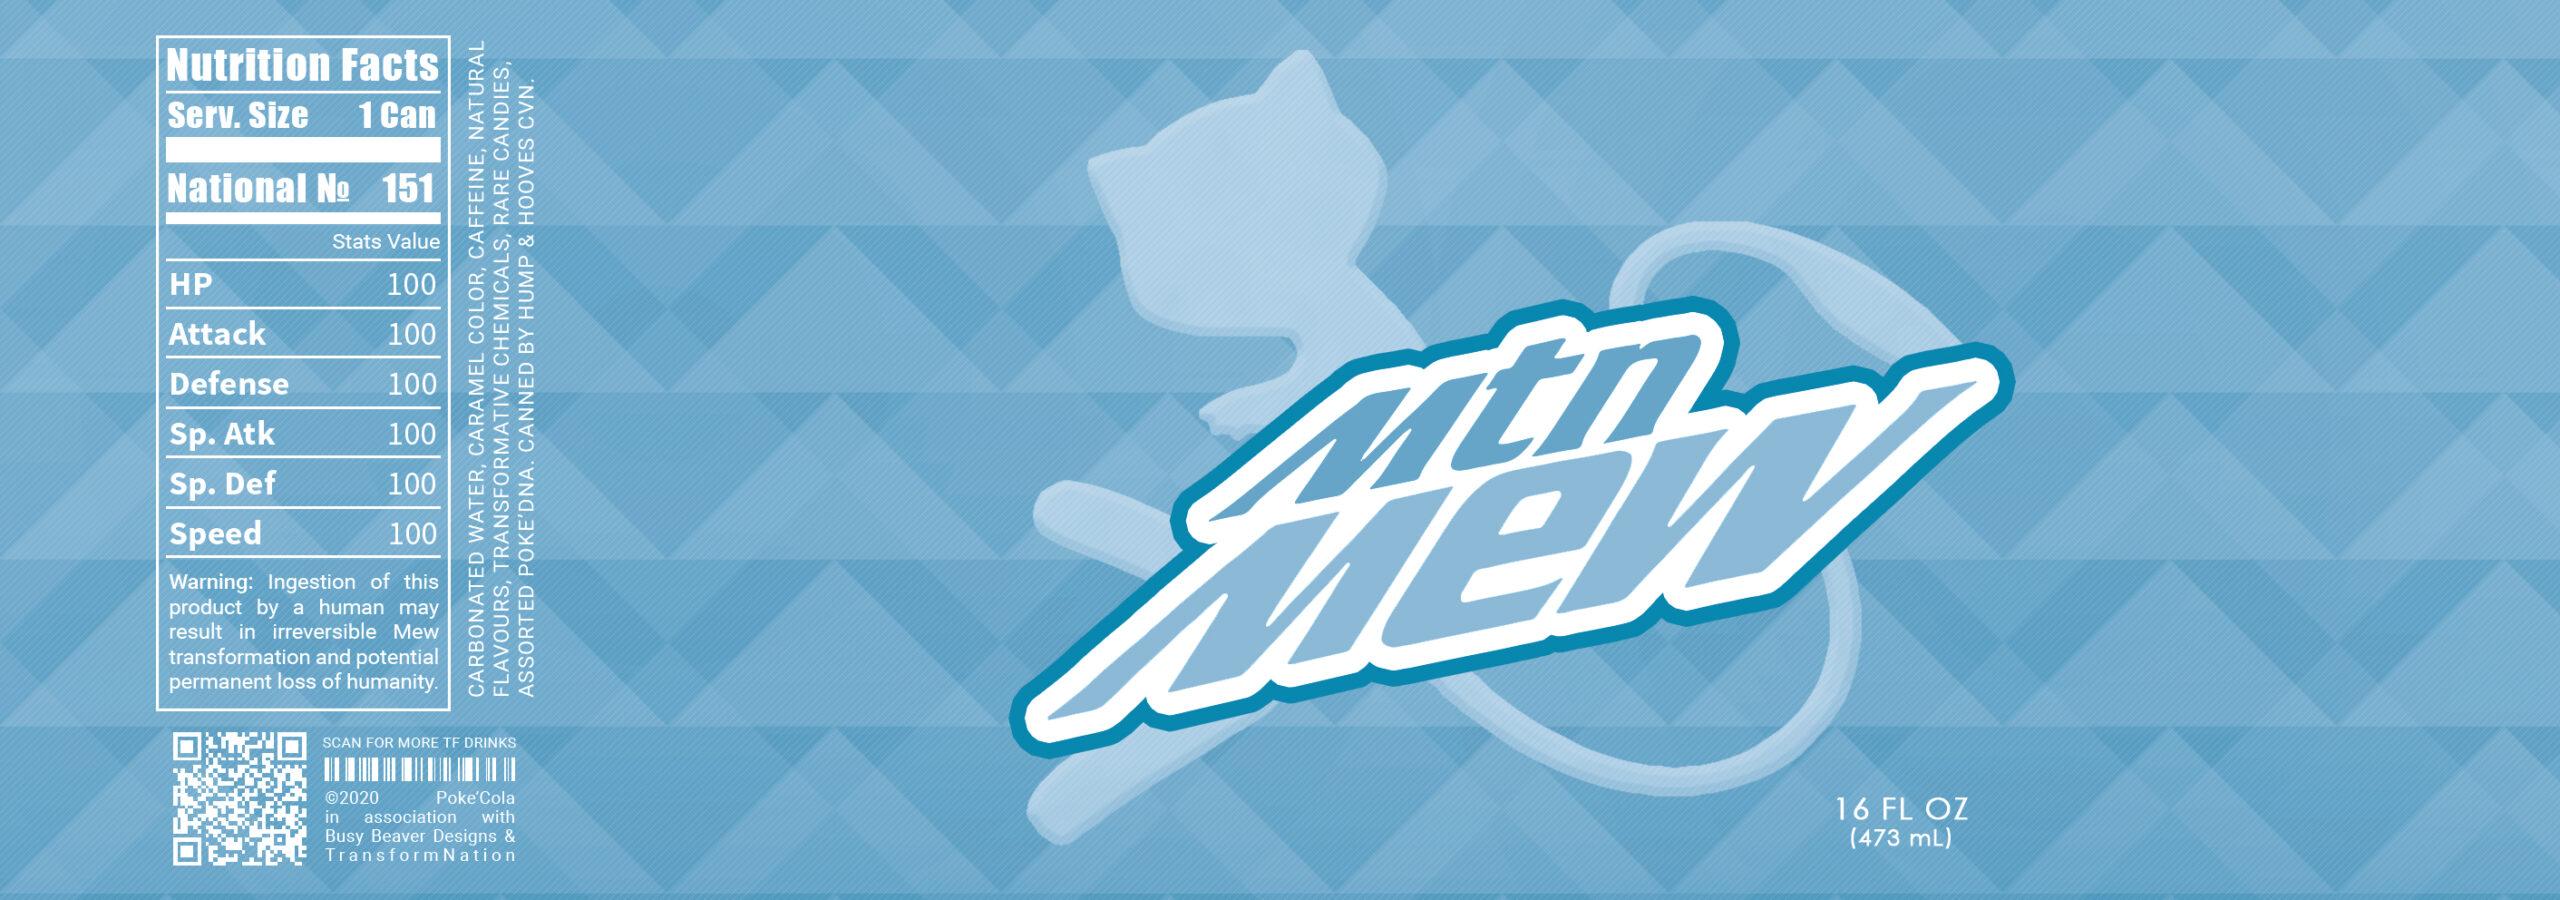 Mountain Mew Shiny Blue Label